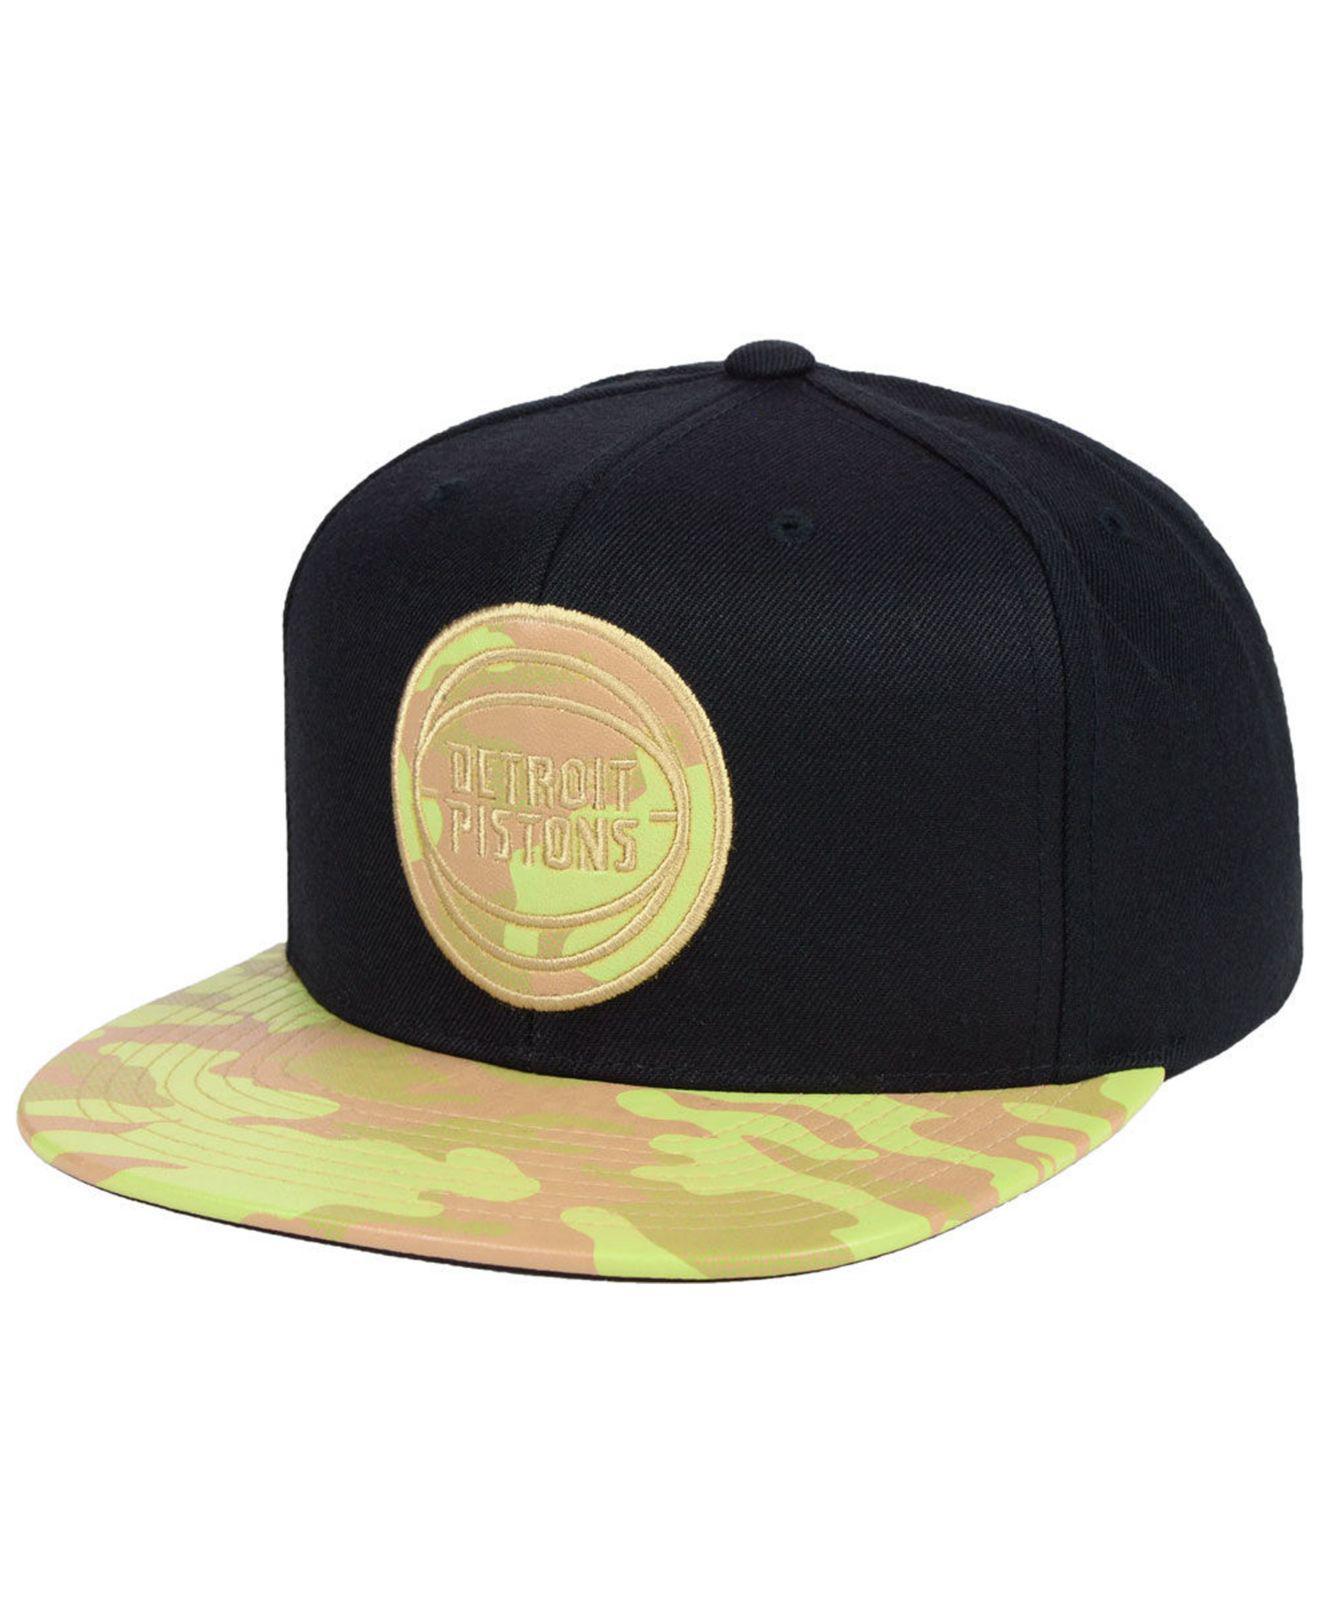 caa84a704 Lyst - Mitchell & Ness Detroit Pistons Natural Camo Snapback Cap for Men